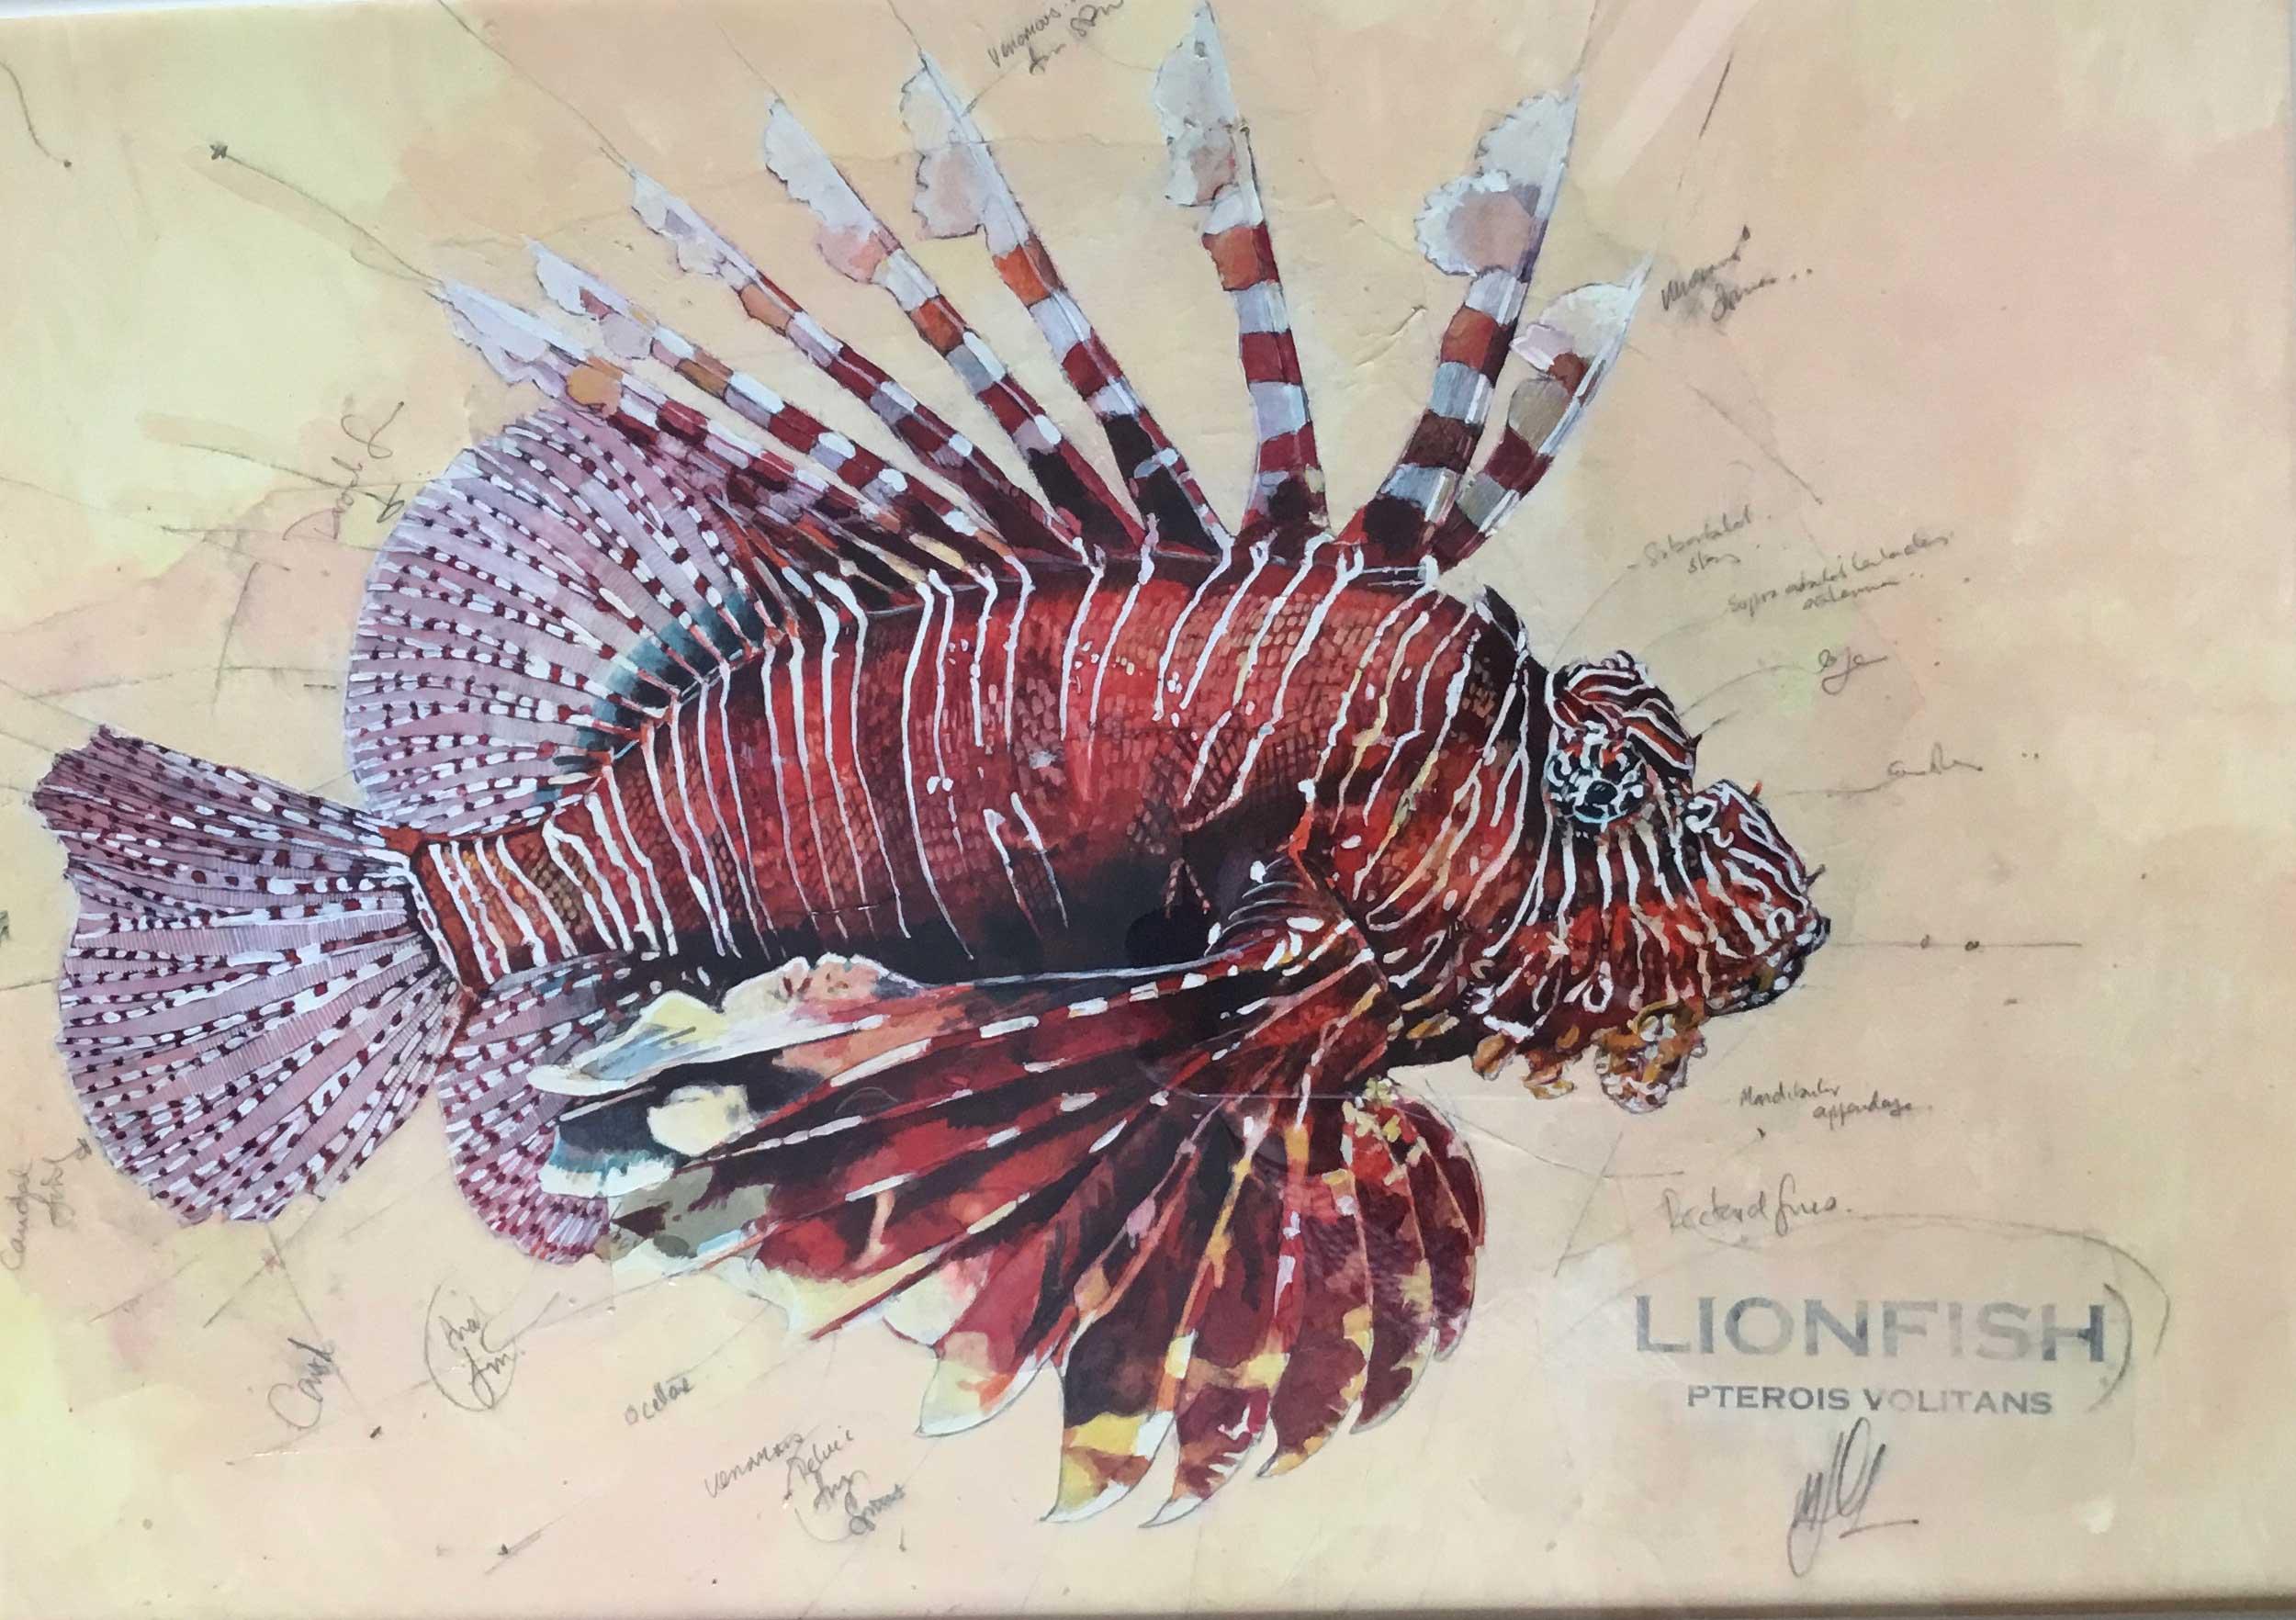 Malcolm Cheape Lionfish